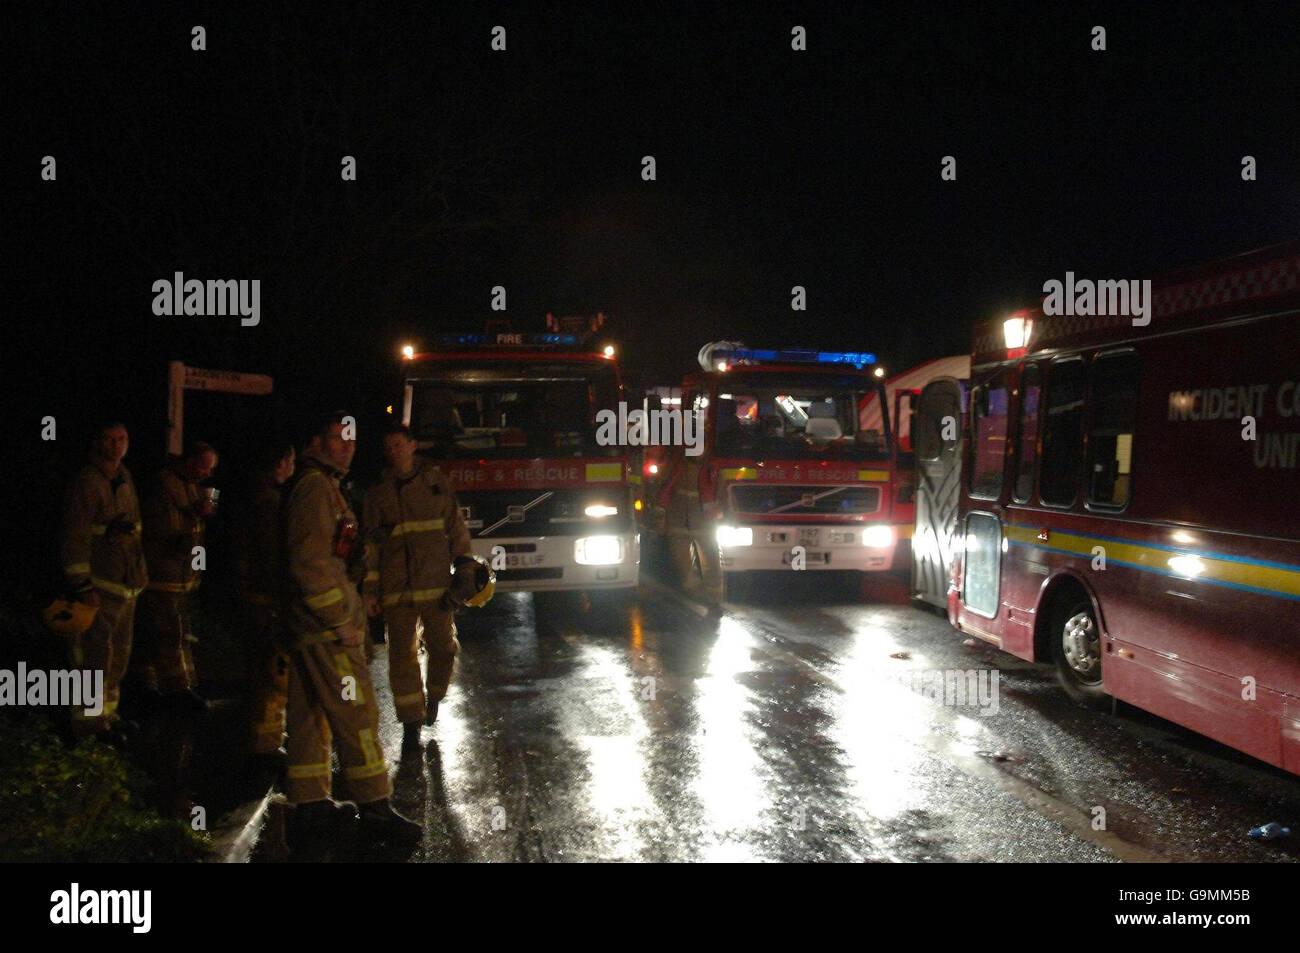 Firework factory fire - Stock Image